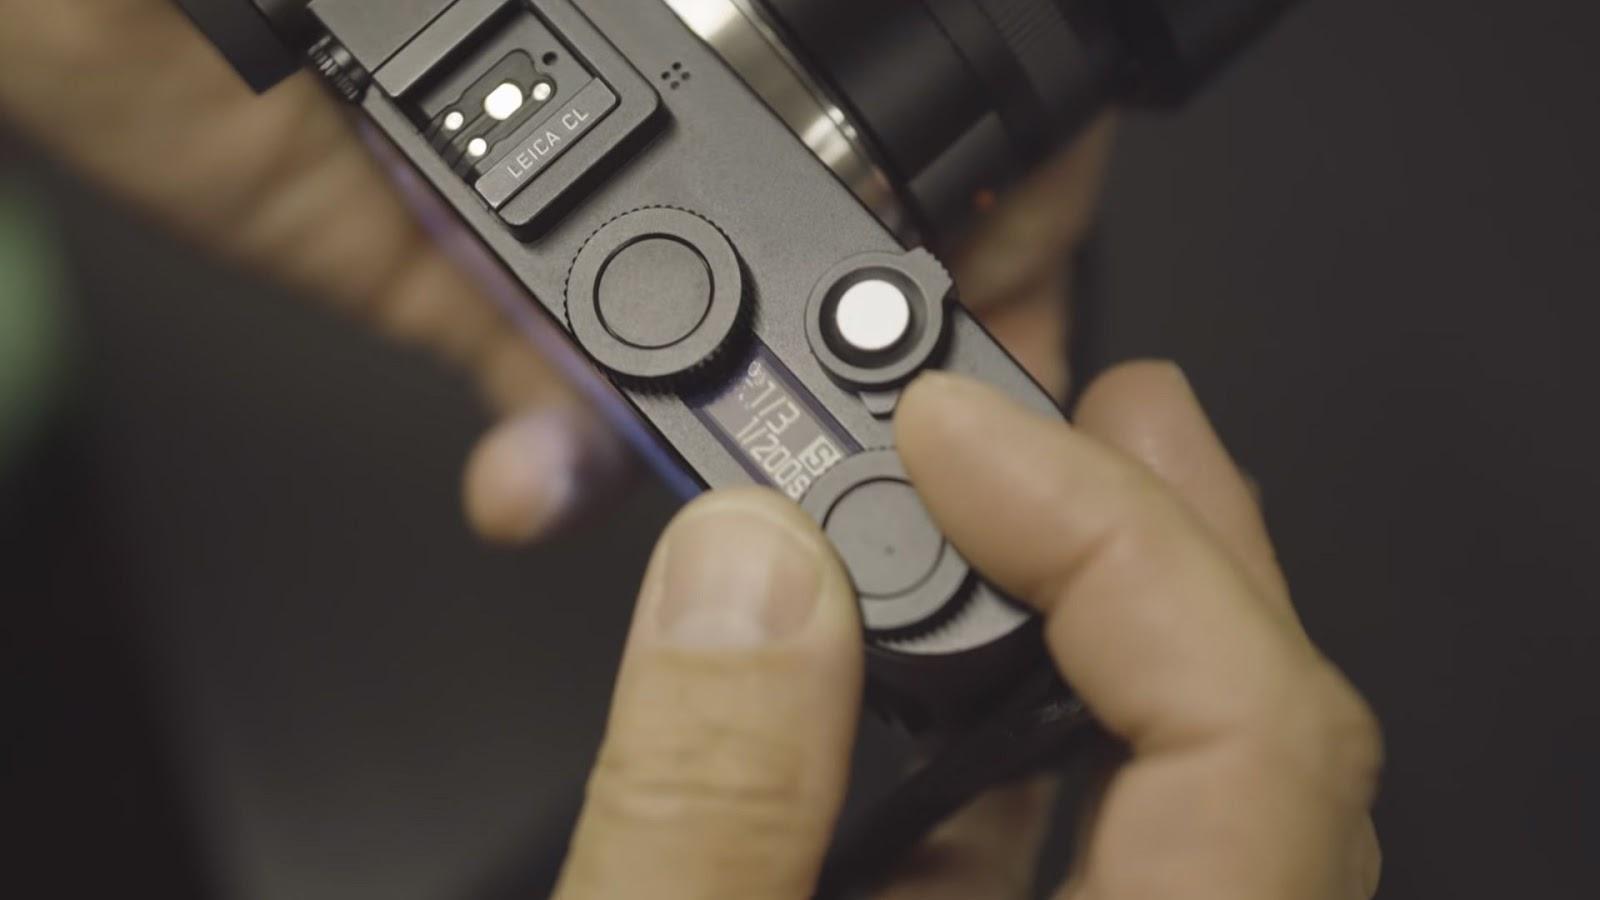 Верхняя панель камеры Leica CL